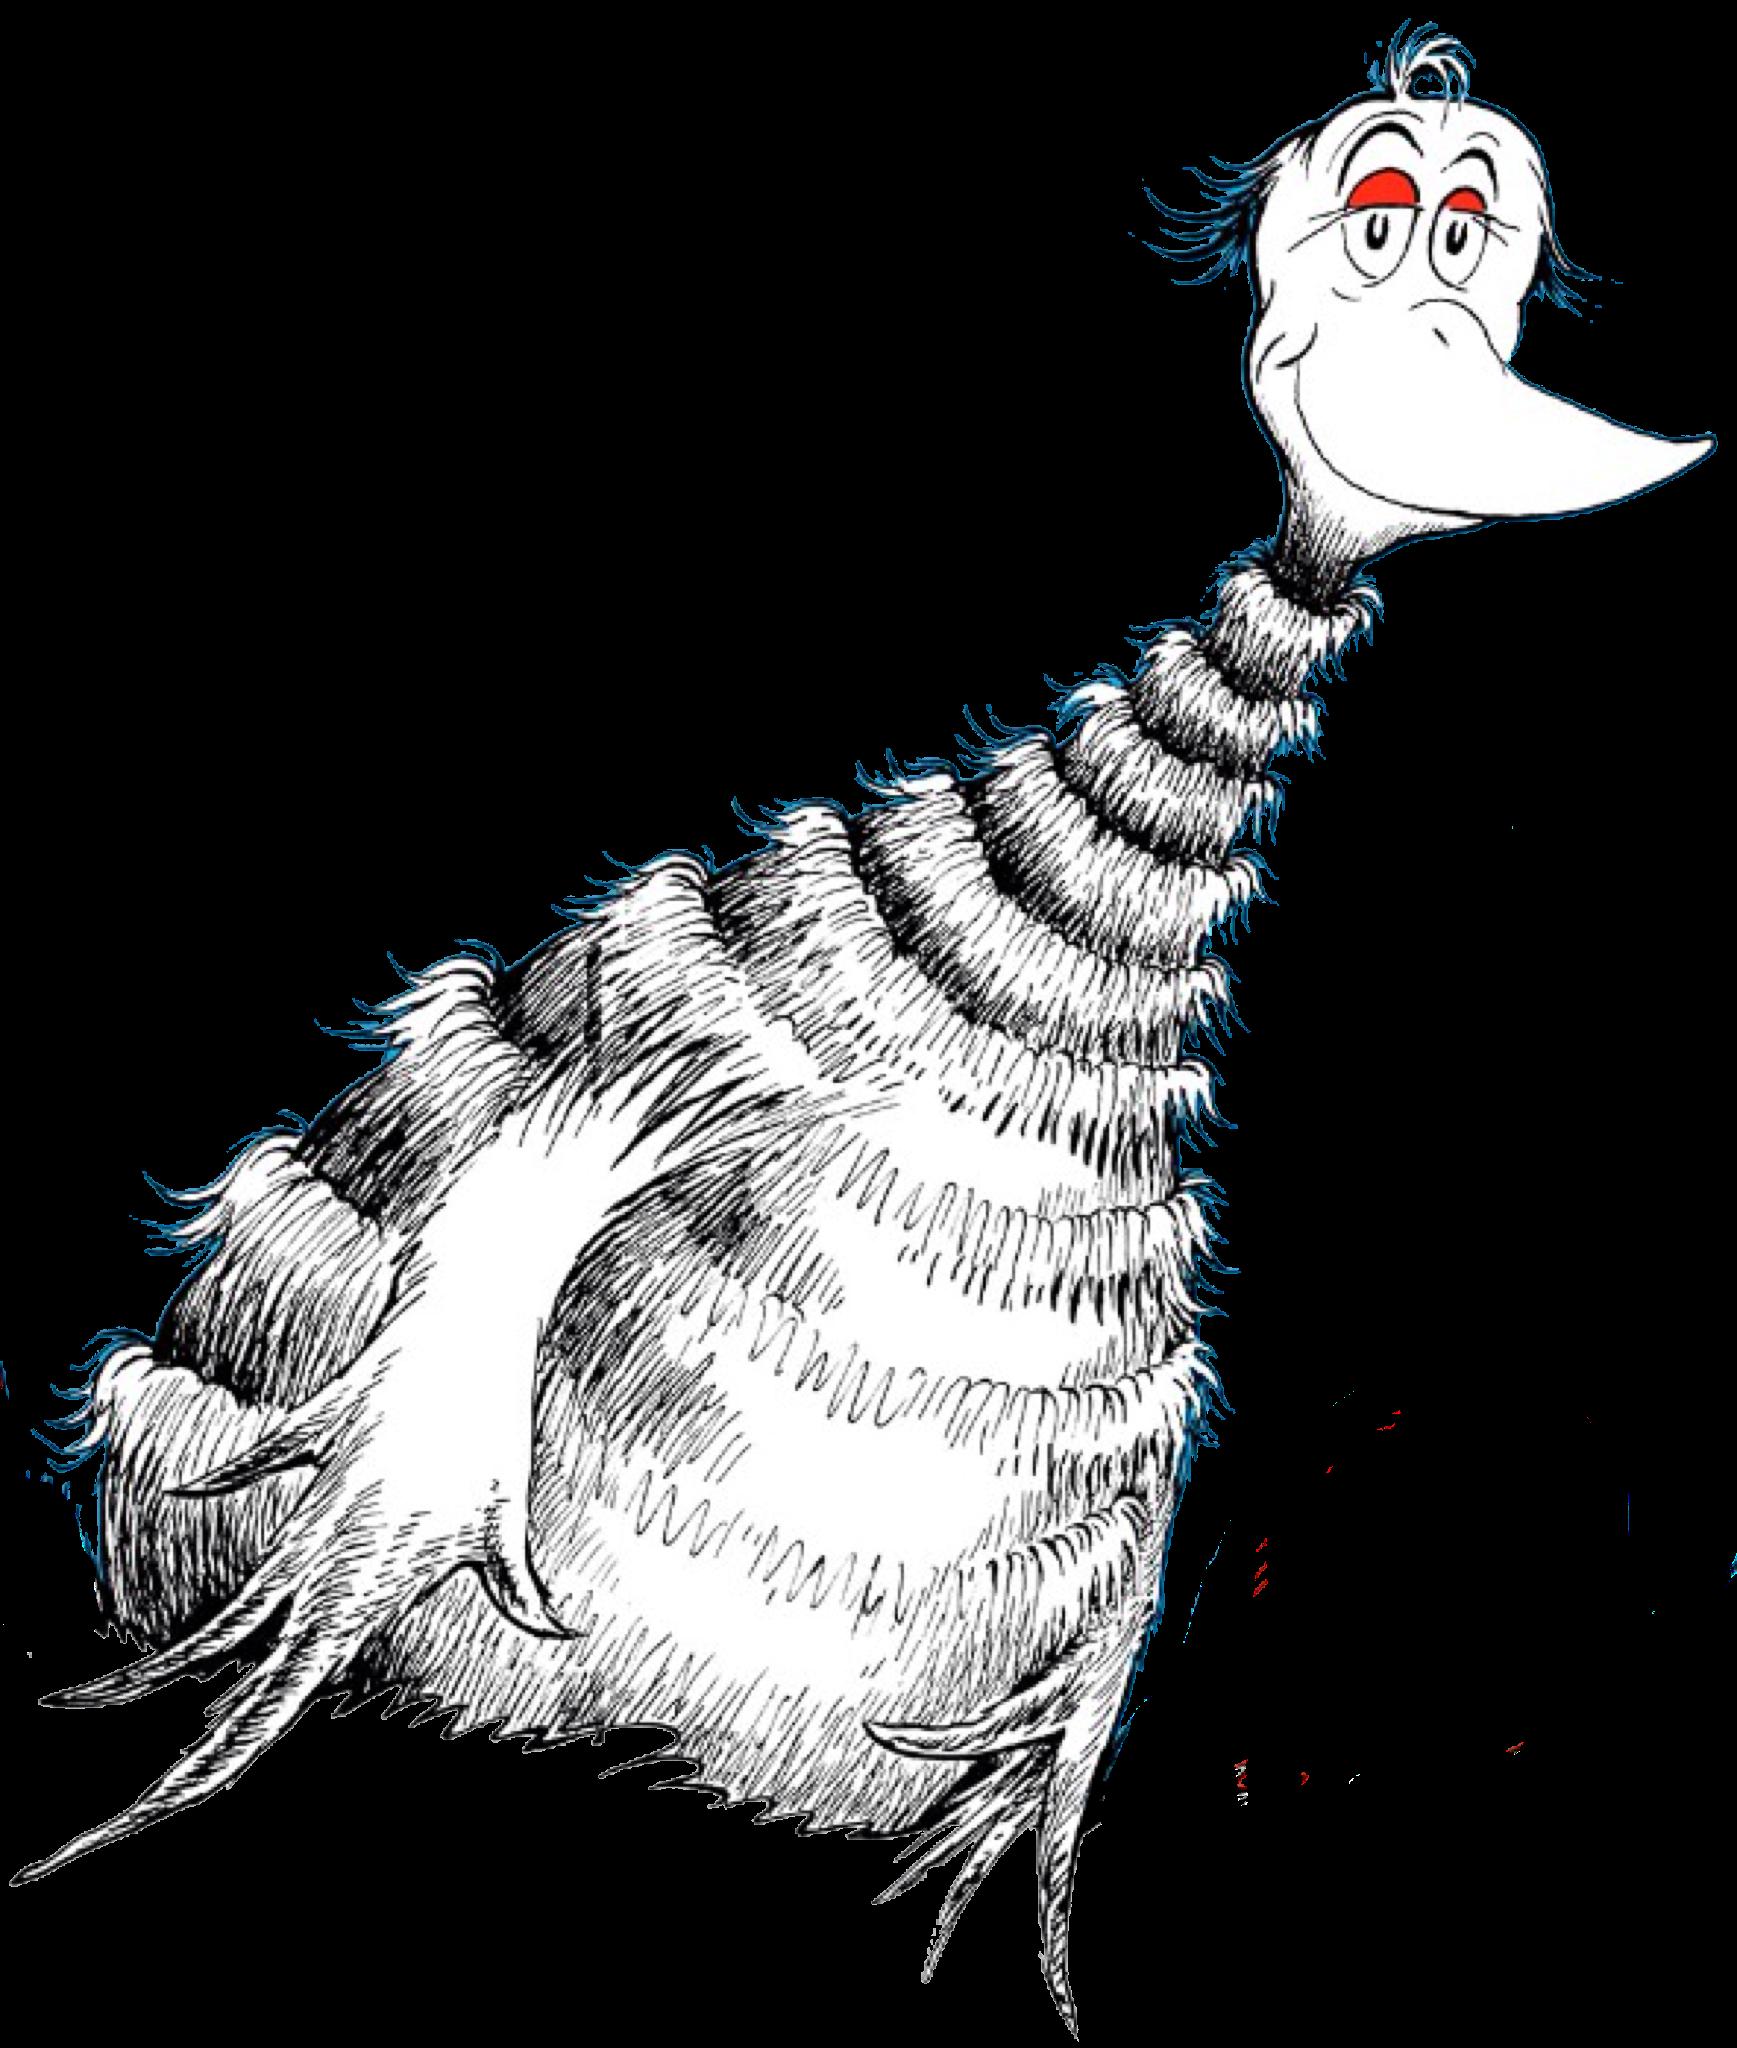 Ruffle-Necked Sala-ma-goox